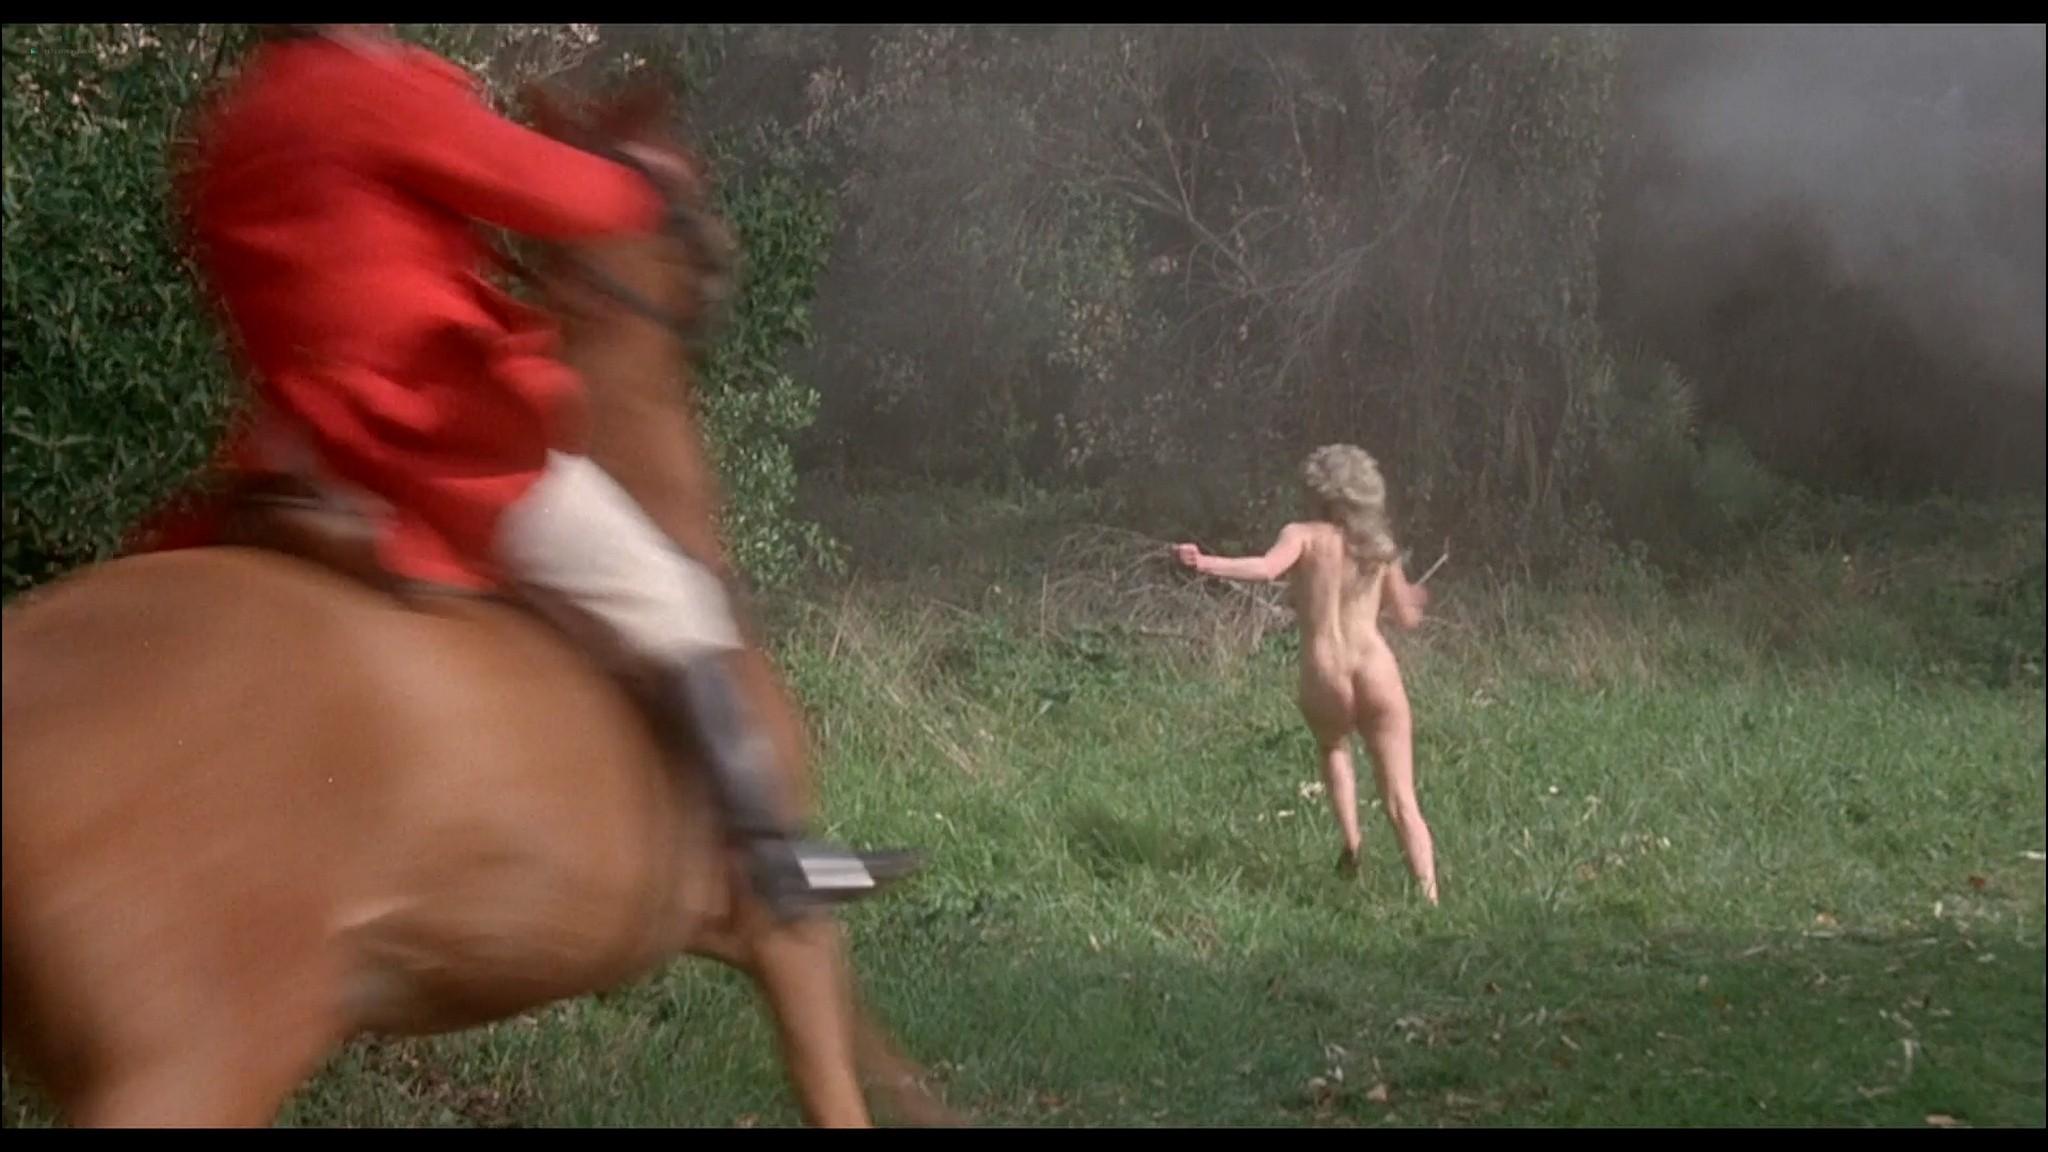 Katya Berger nude full frontal Debra Berger Mandy Rice Davies Annie Belle etc nude too Nana 1993 HD 1080p Web 012